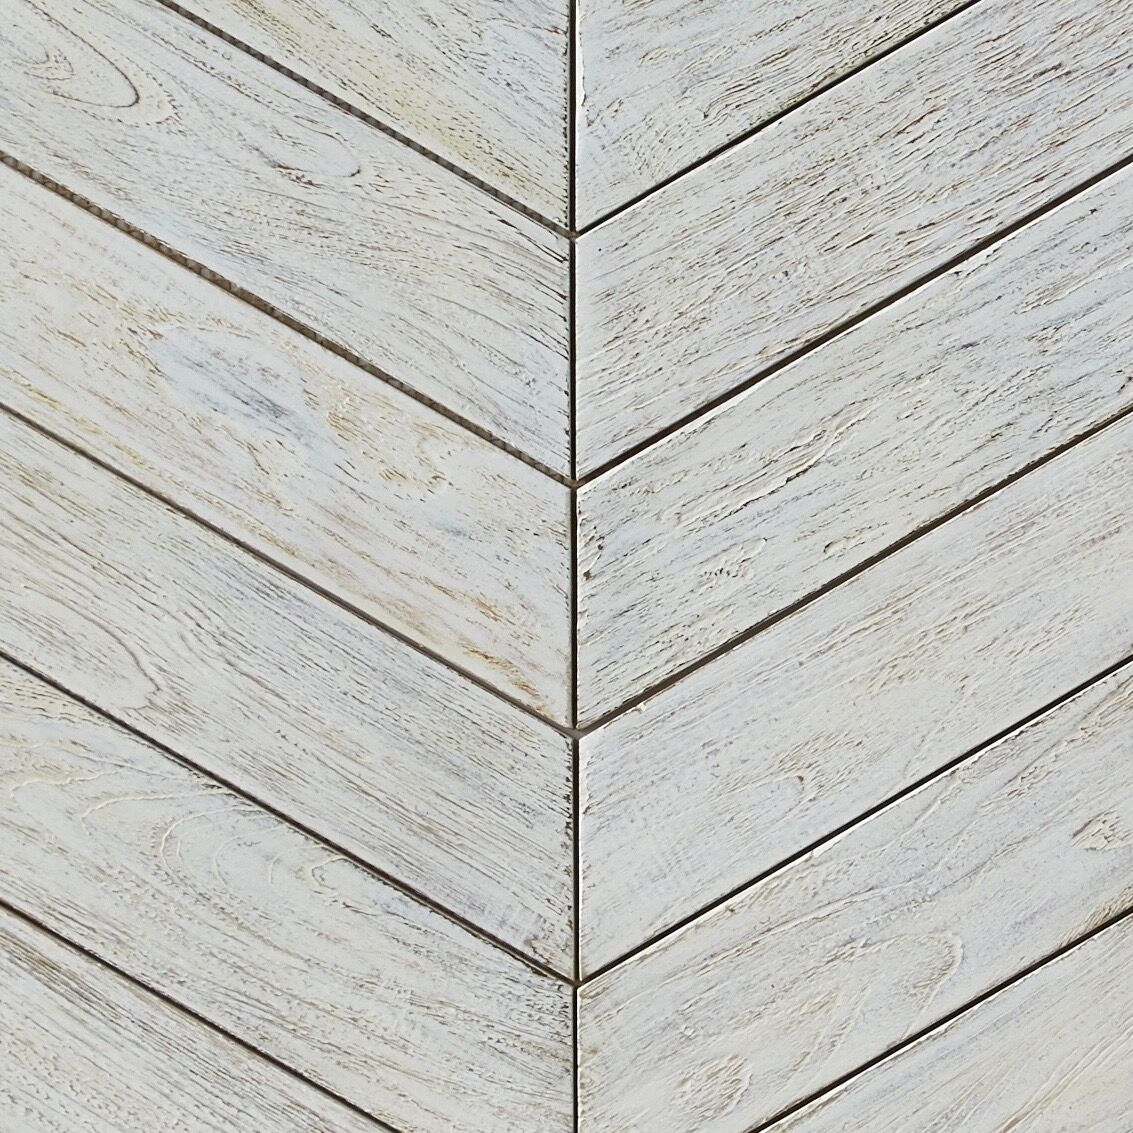 white matte finish - Teak Tile - Chevron